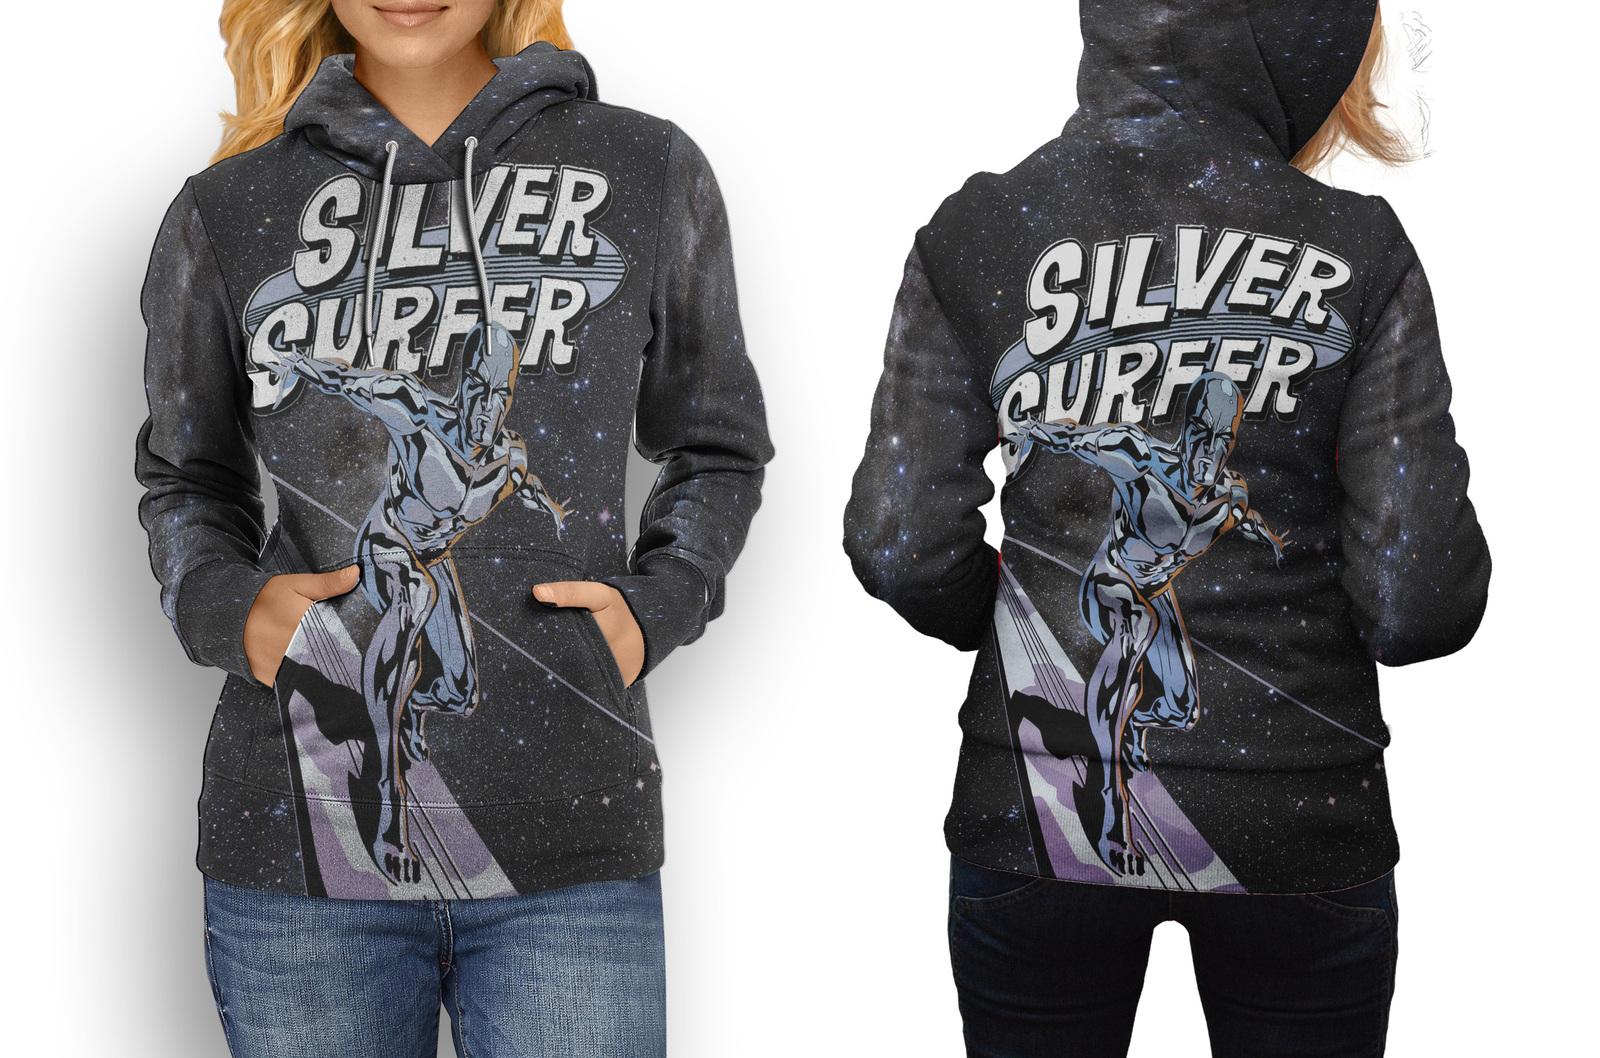 Hoodie women silver surfer